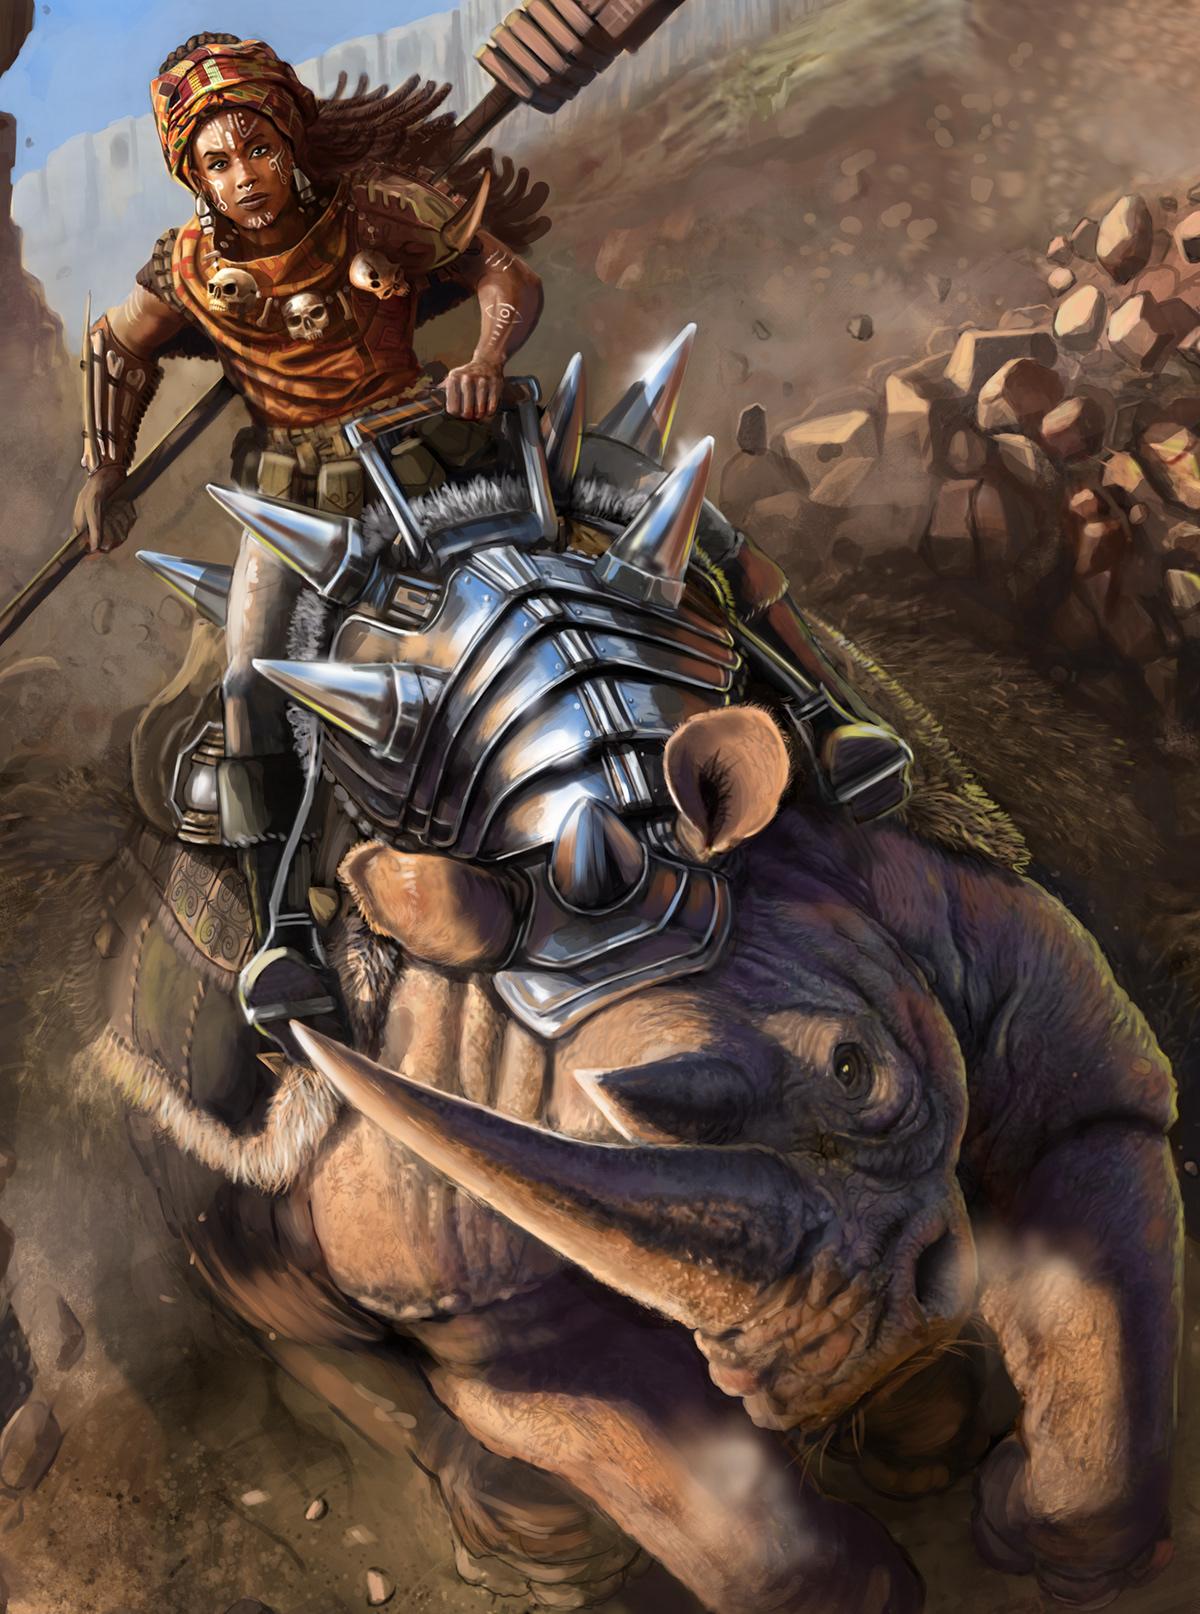 D&D,desert,dnd,druid,Magic  ,Rhino,Rhinoceros,stone